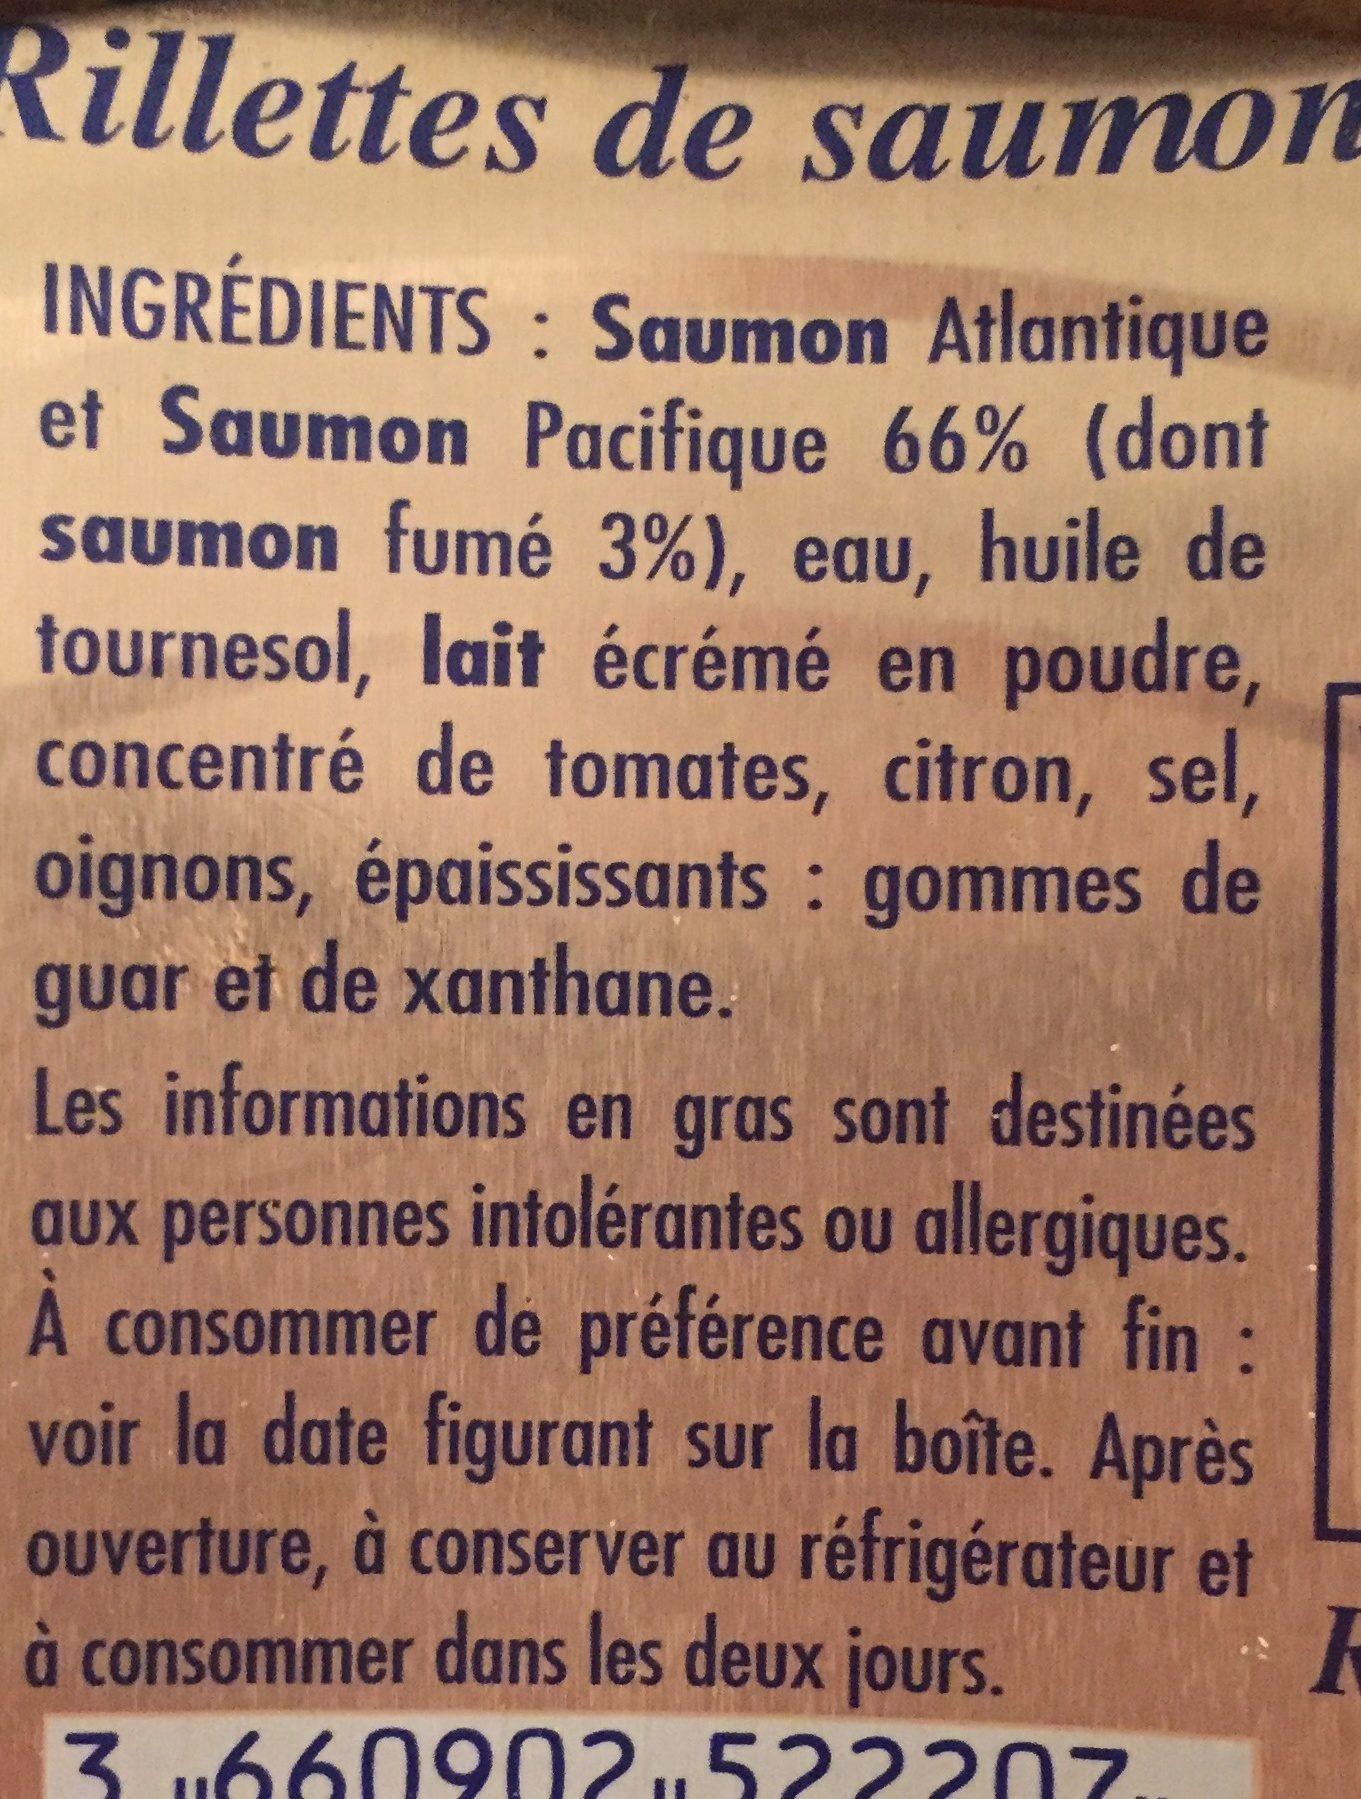 Rilette de saumon Recette Bretonne - Ingredients